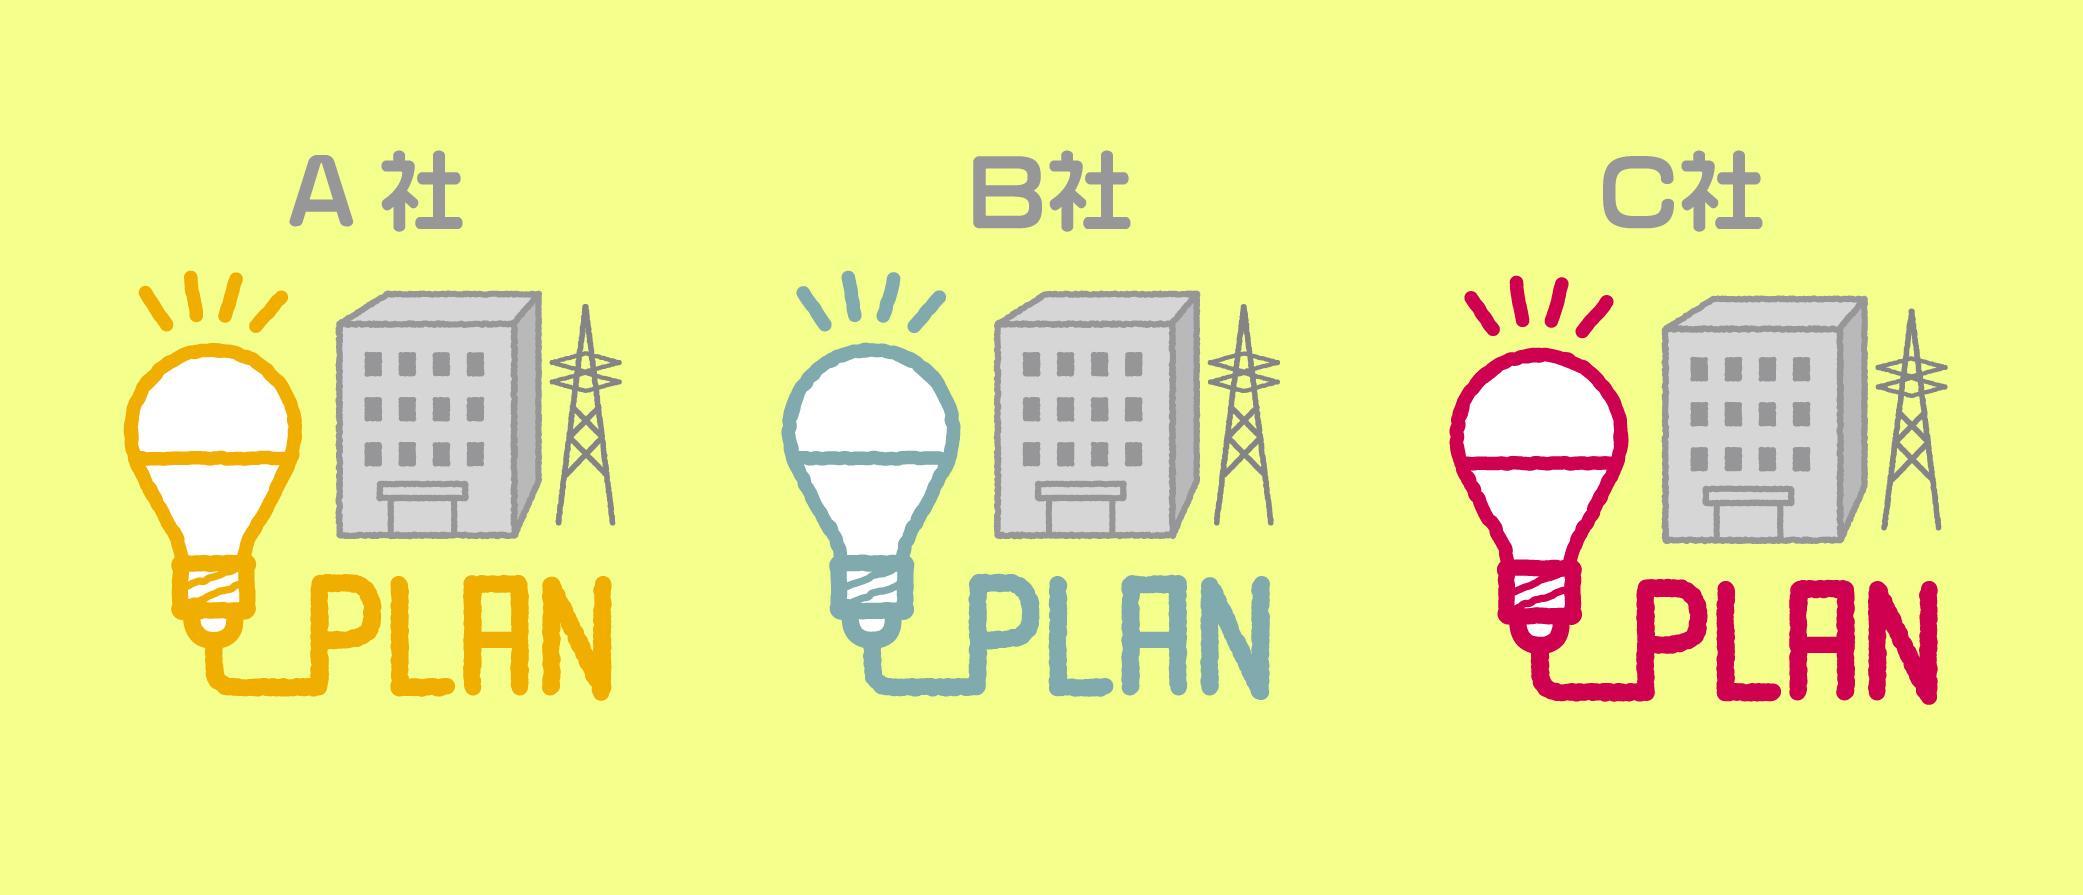 electric power company